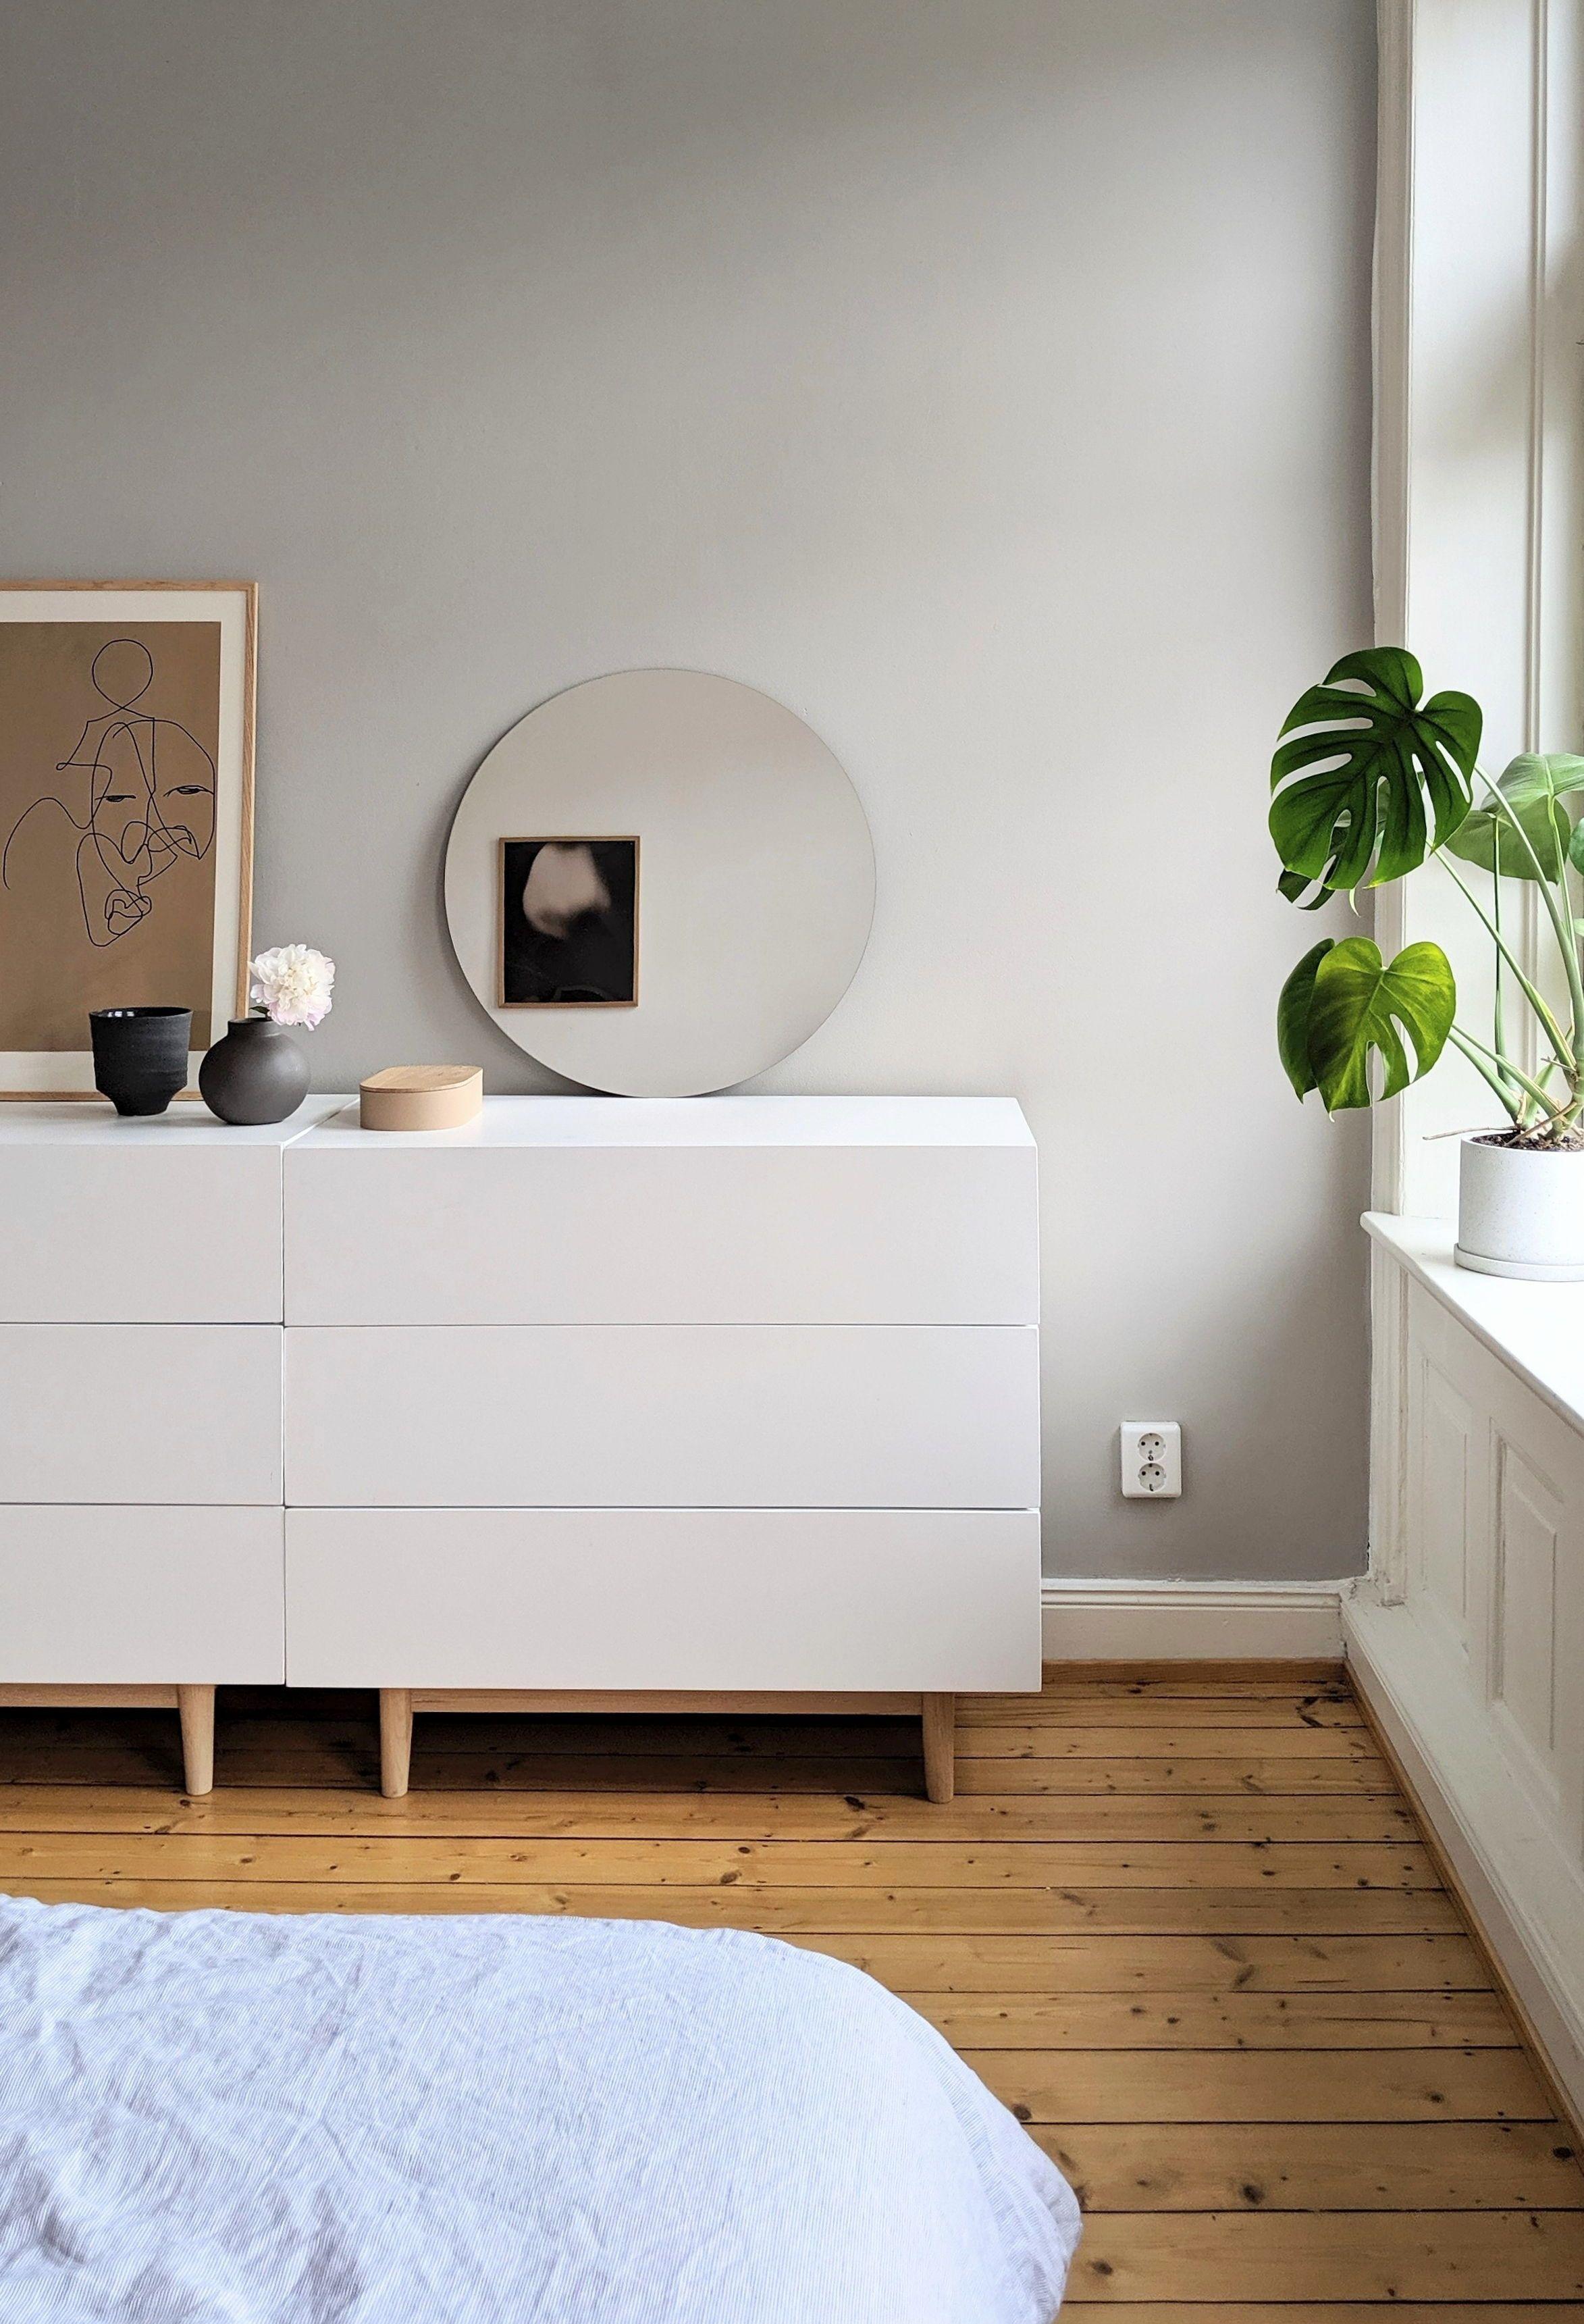 Wandfarbe Grau Braun Furs Schlafzimmer Von Www Kolorat De Kolorat